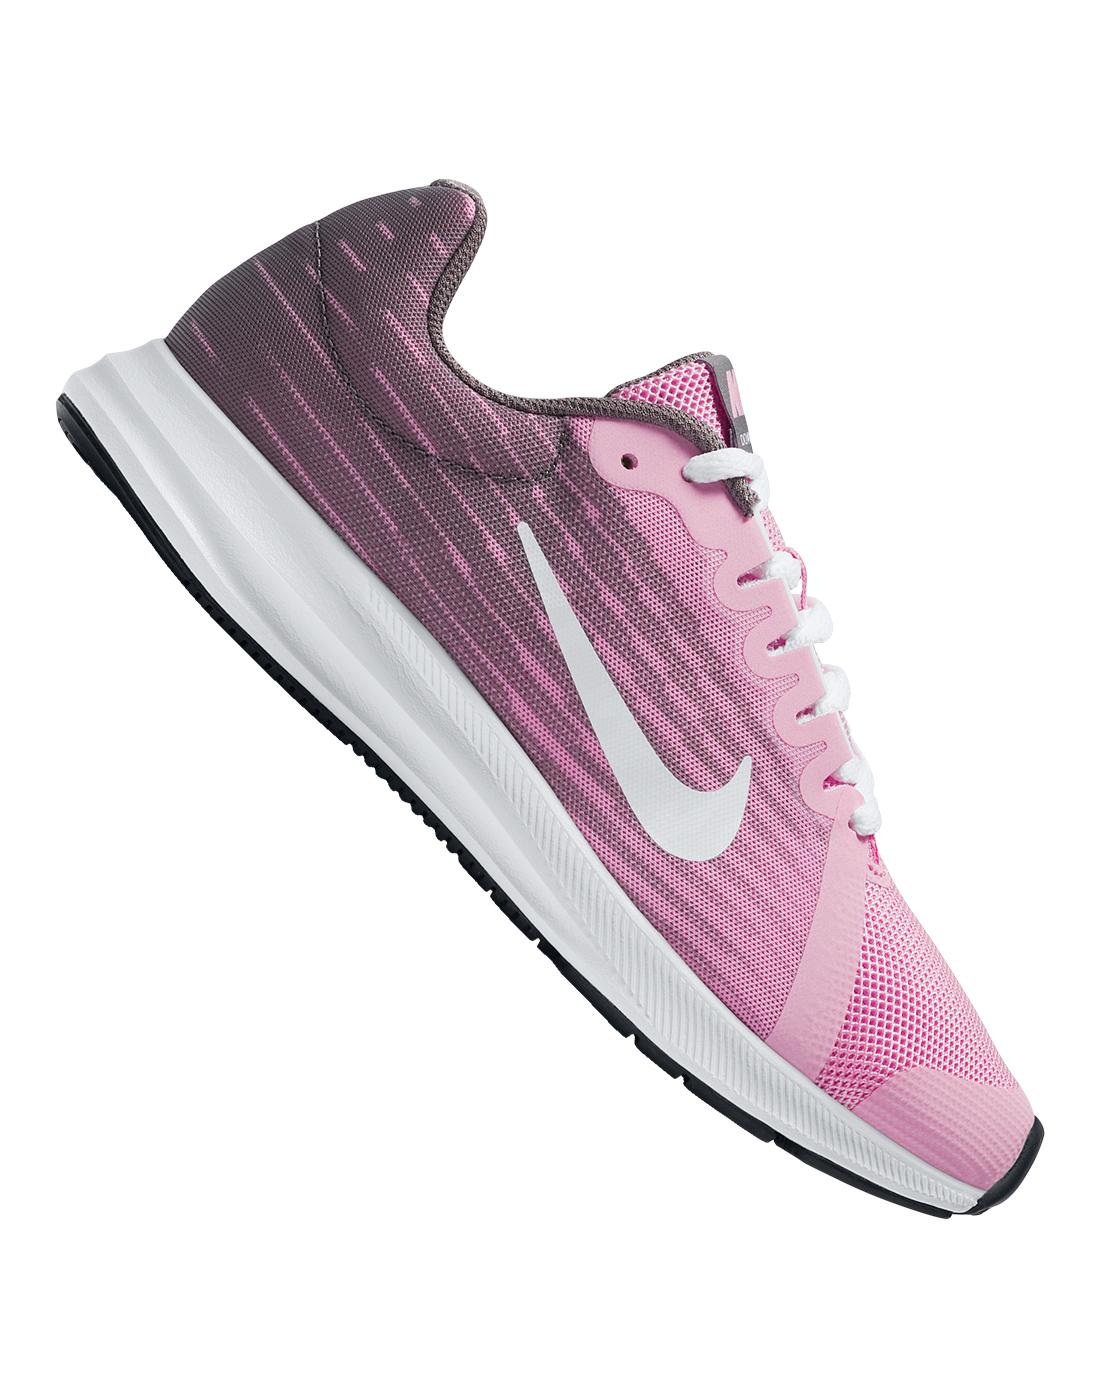 c31cf5b3c3a6 Nike. Older Girls Downshifter. Older Girls Downshifter ...